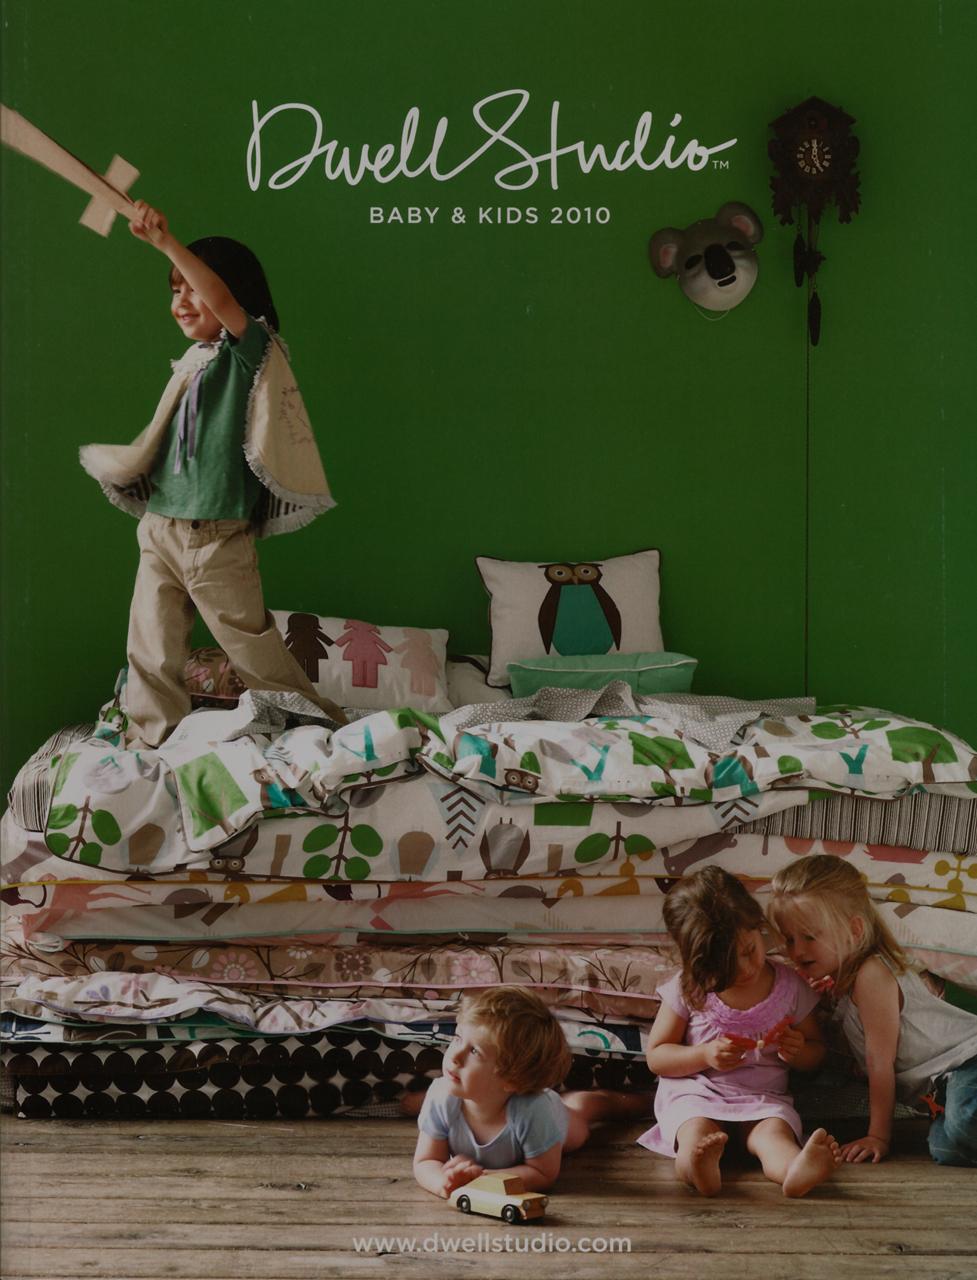 RG-TSad_DwellStudio_2010_Baby&Kids_Cover.jpg